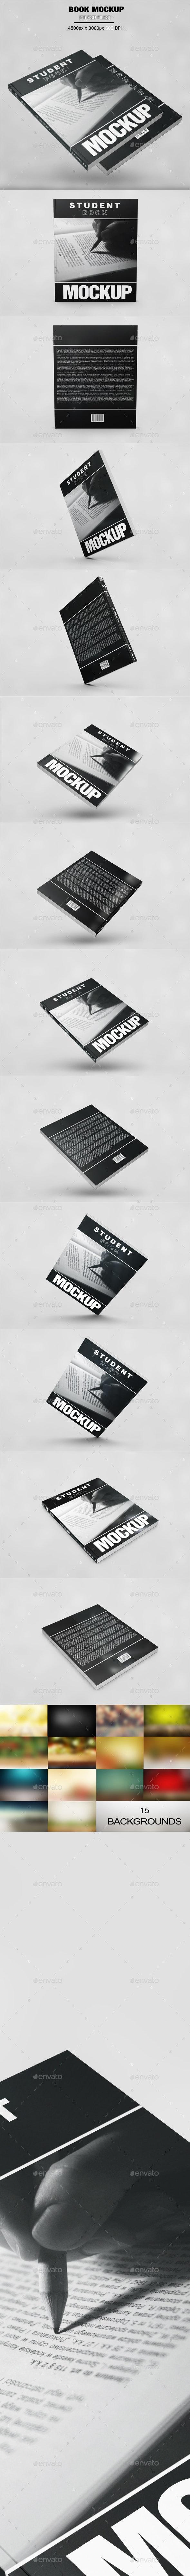 Student Book Mockup - Product Mock-Ups Graphics